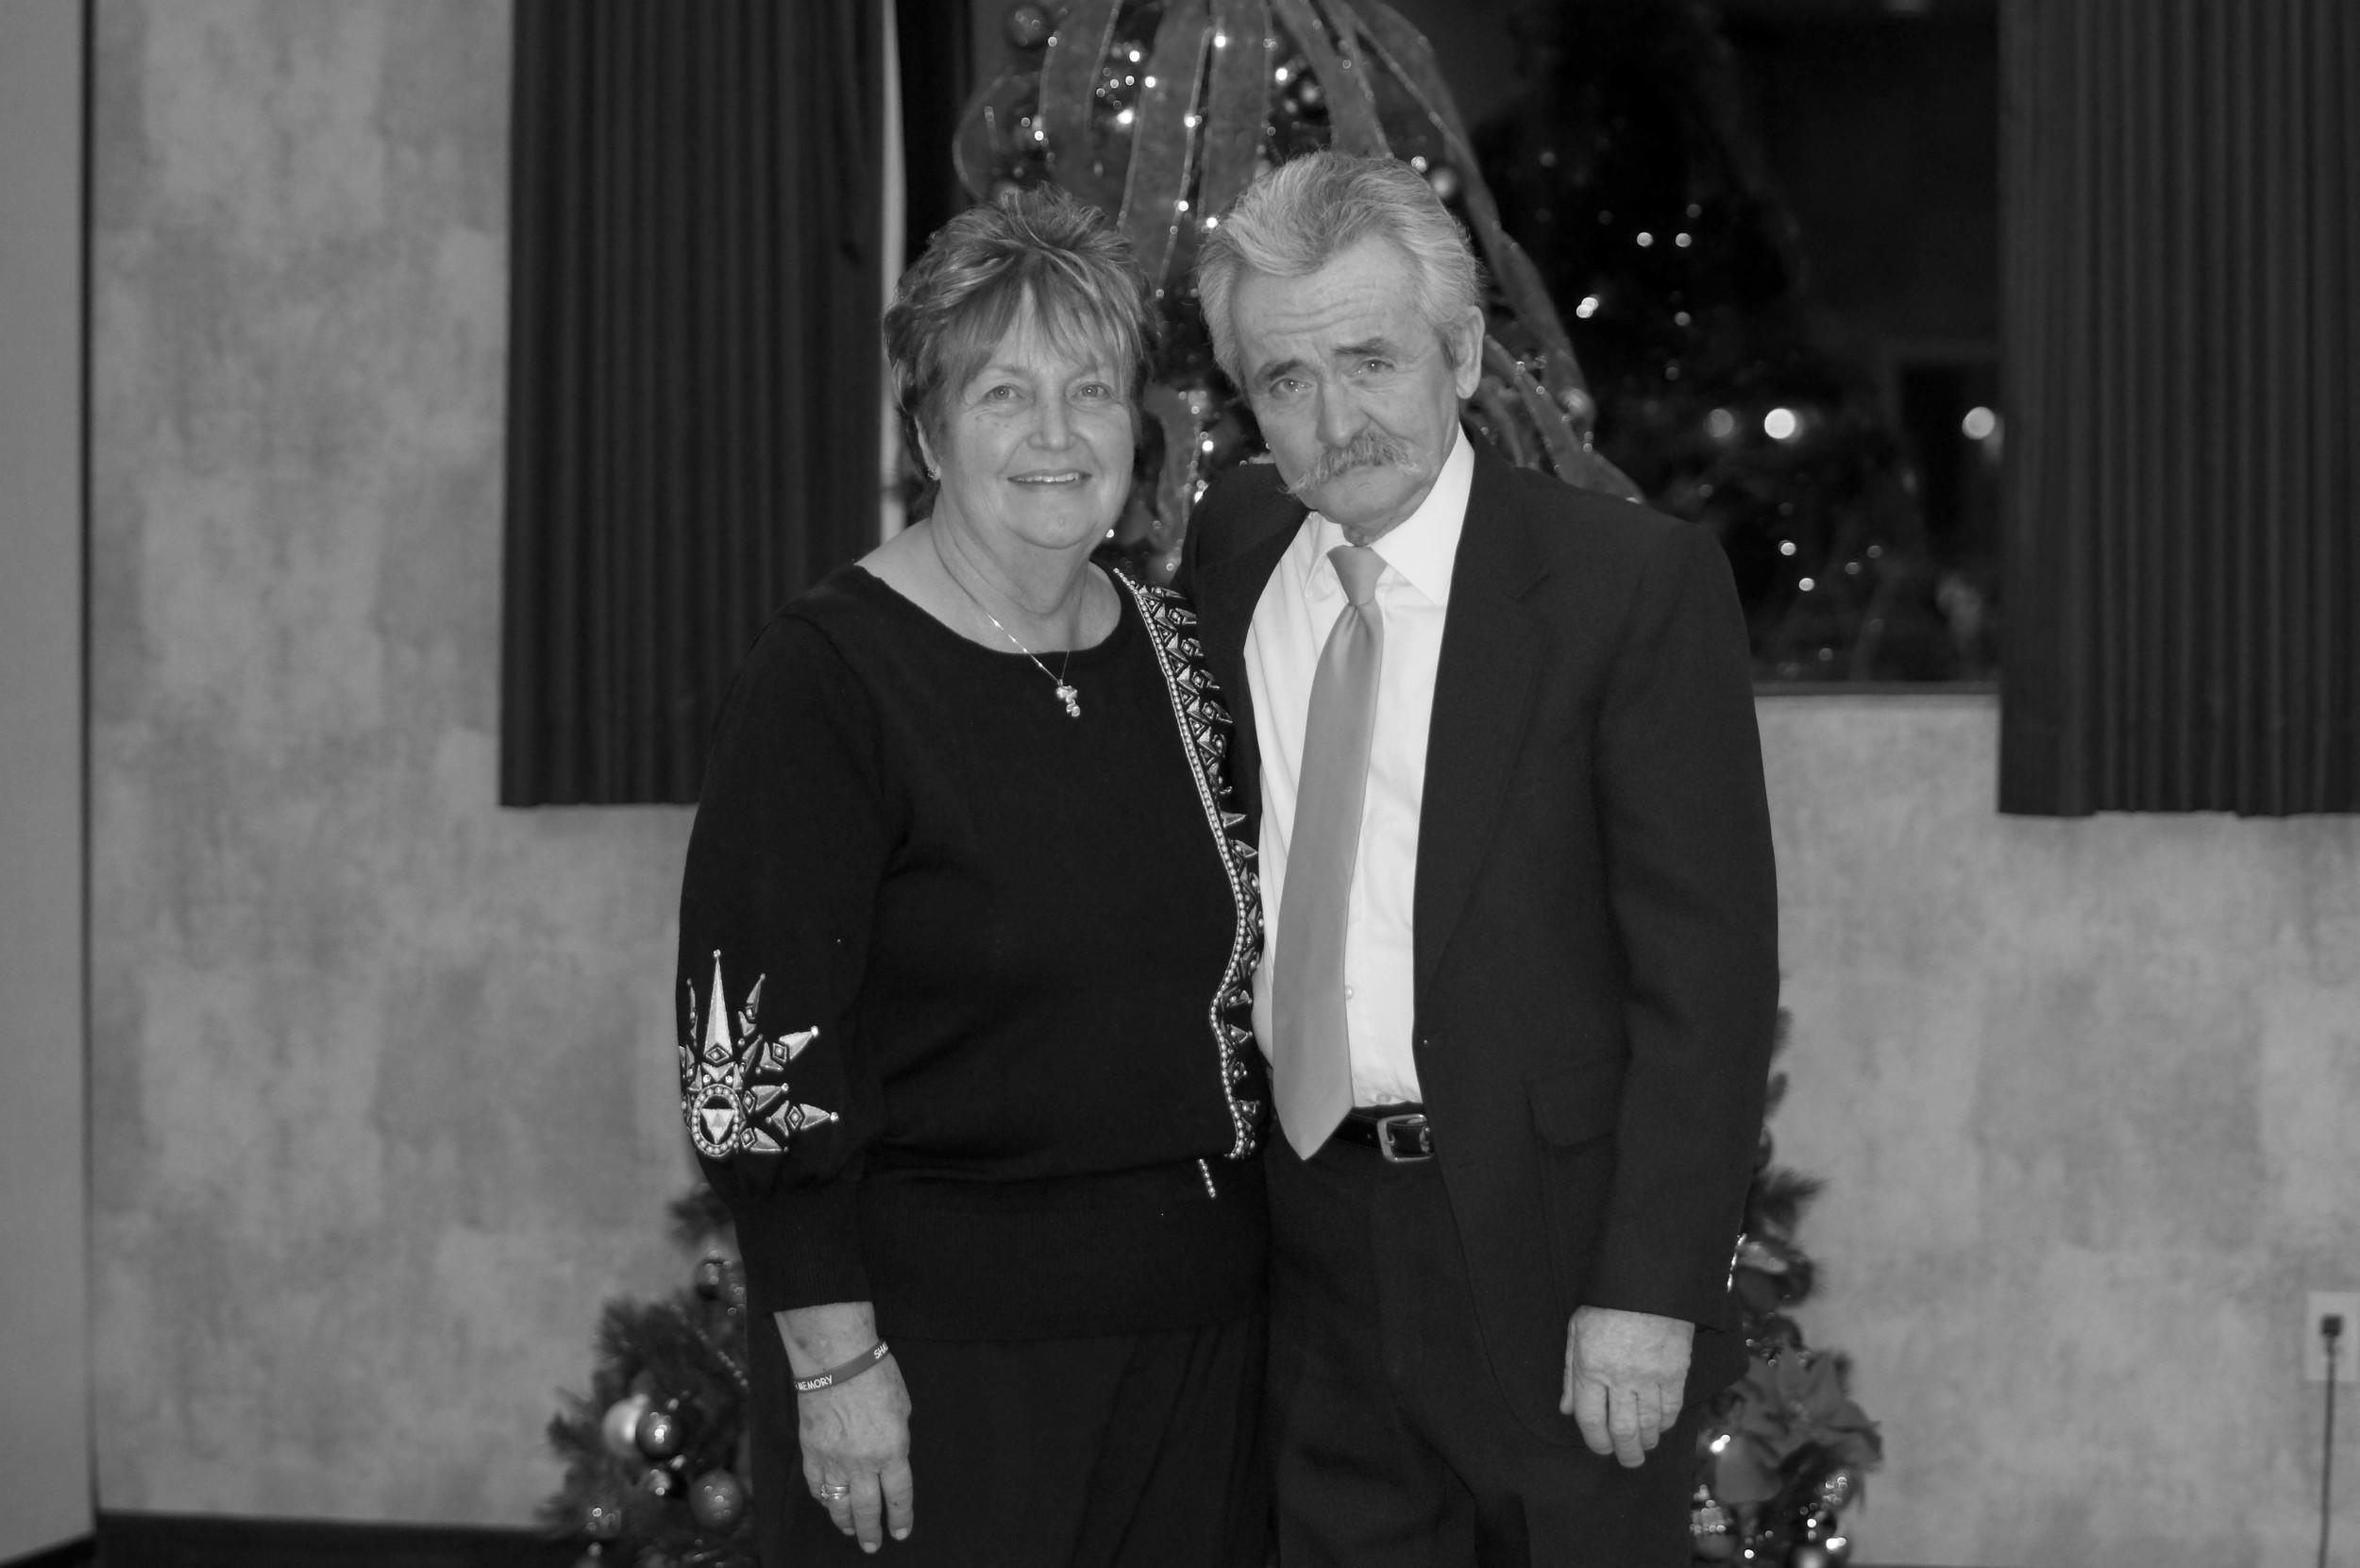 Michael and Mindy Wedding5 (40 of 518).jpg